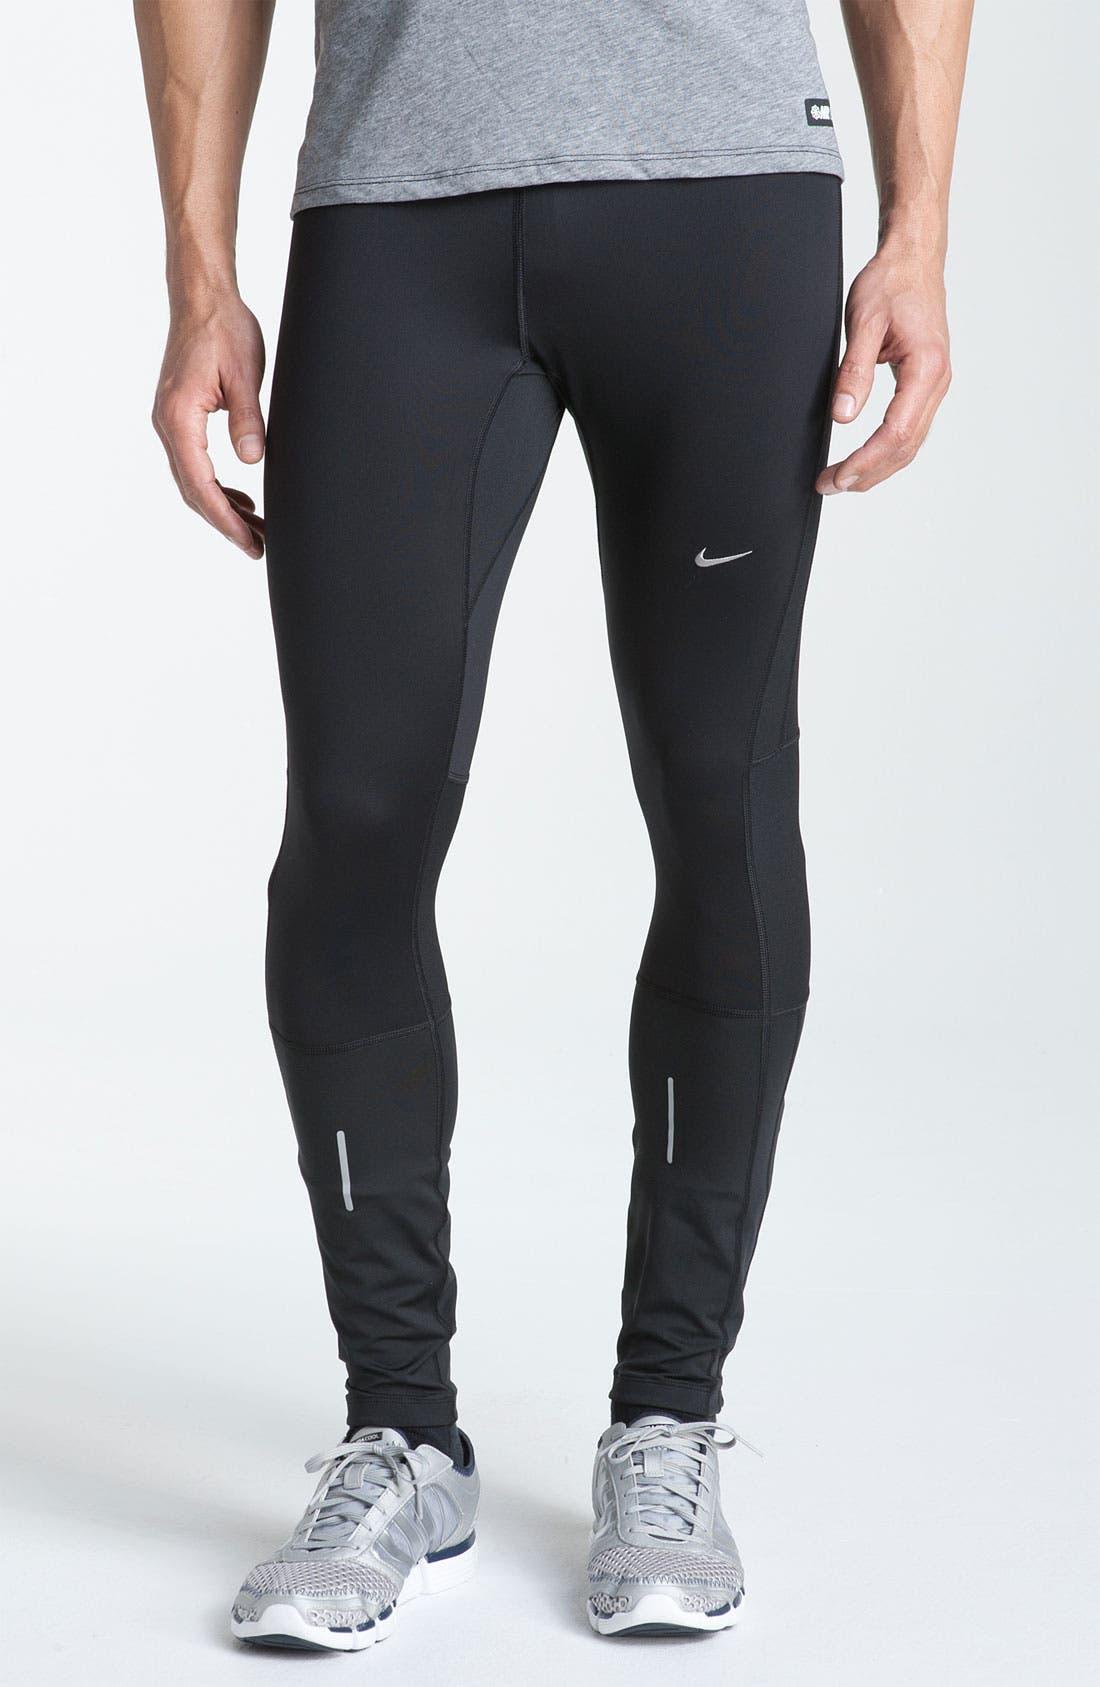 Alternate Image 1 Selected - Nike 'Element' Thermal Leggings (Online Exclusive)